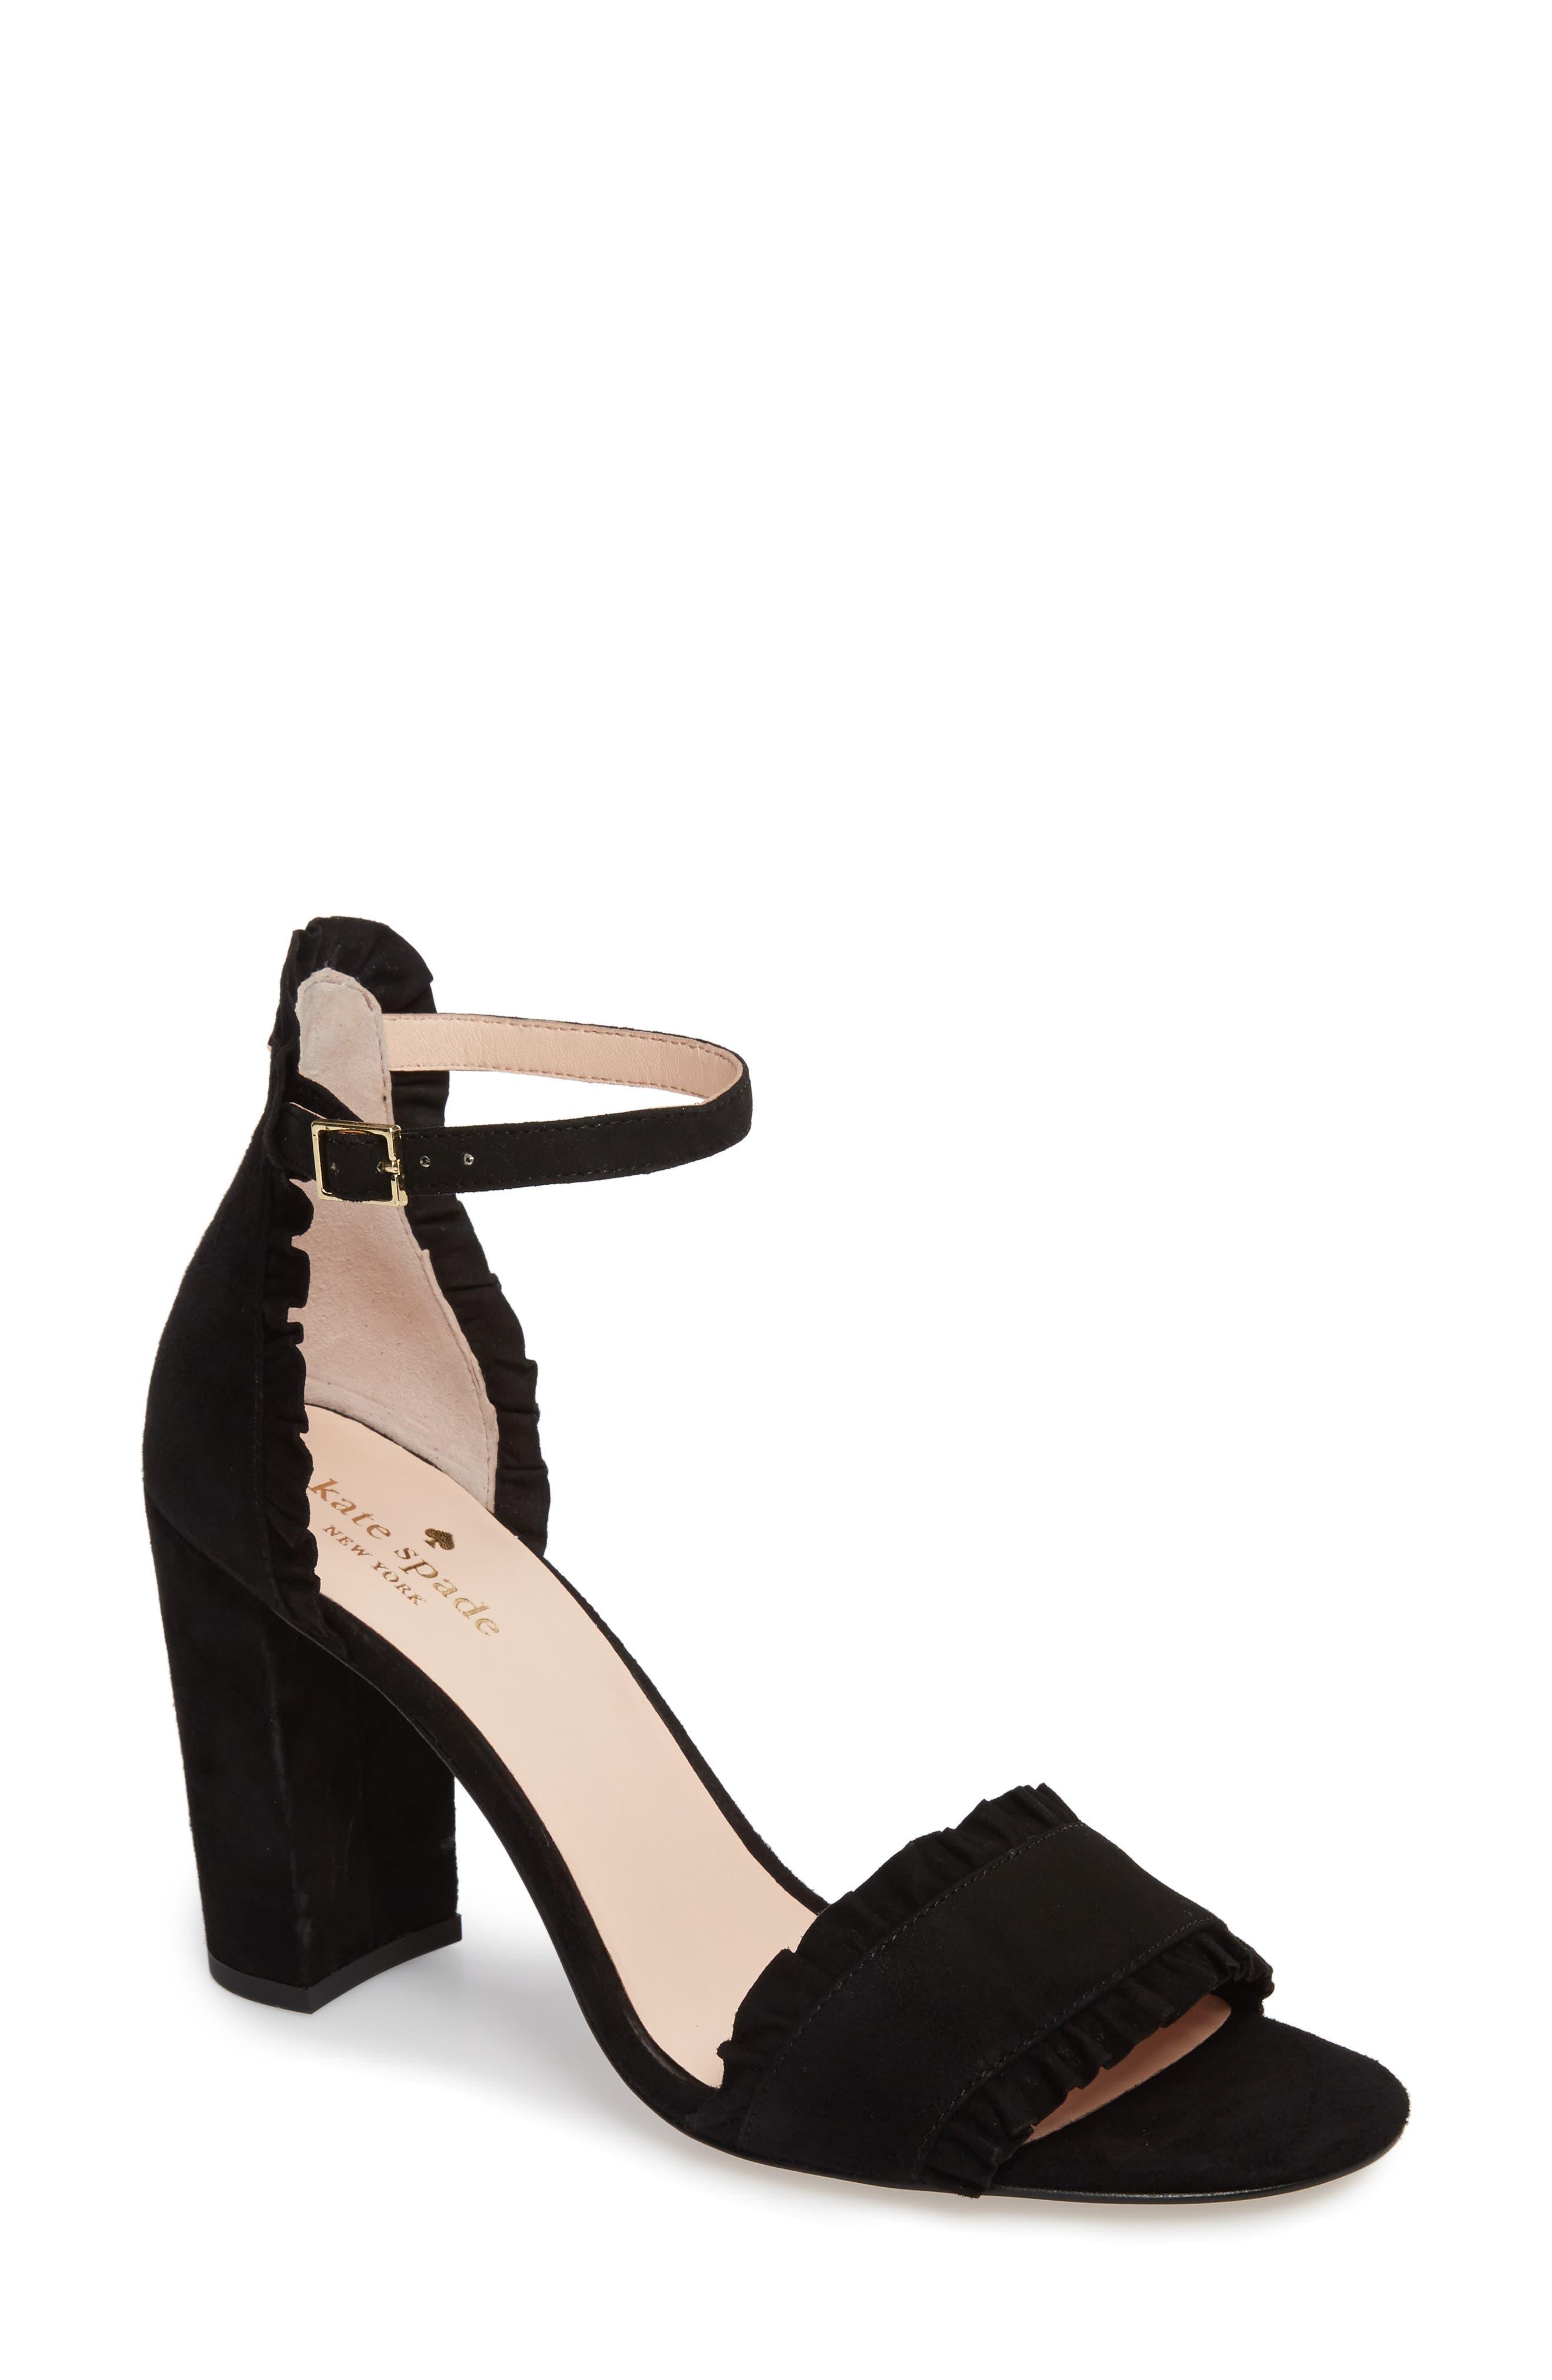 odele ruffle sandal,                         Main,                         color, Black Suede